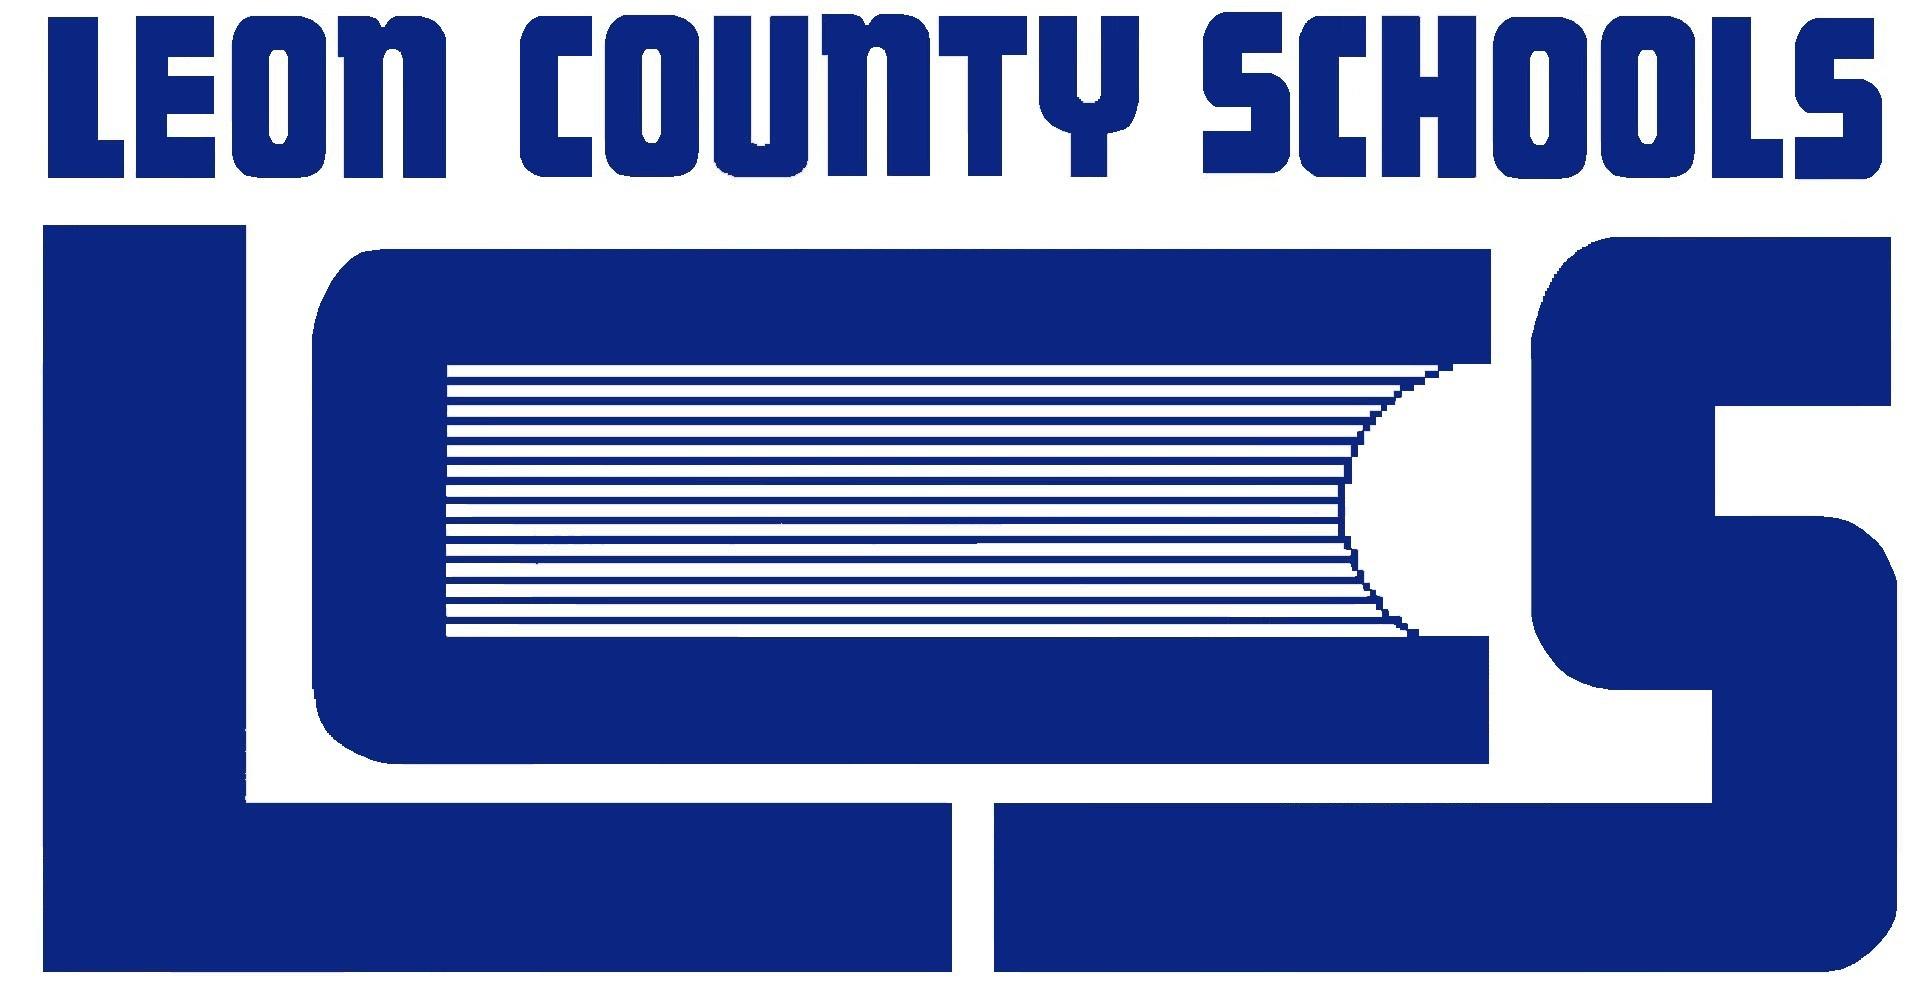 Leon County Schools logo